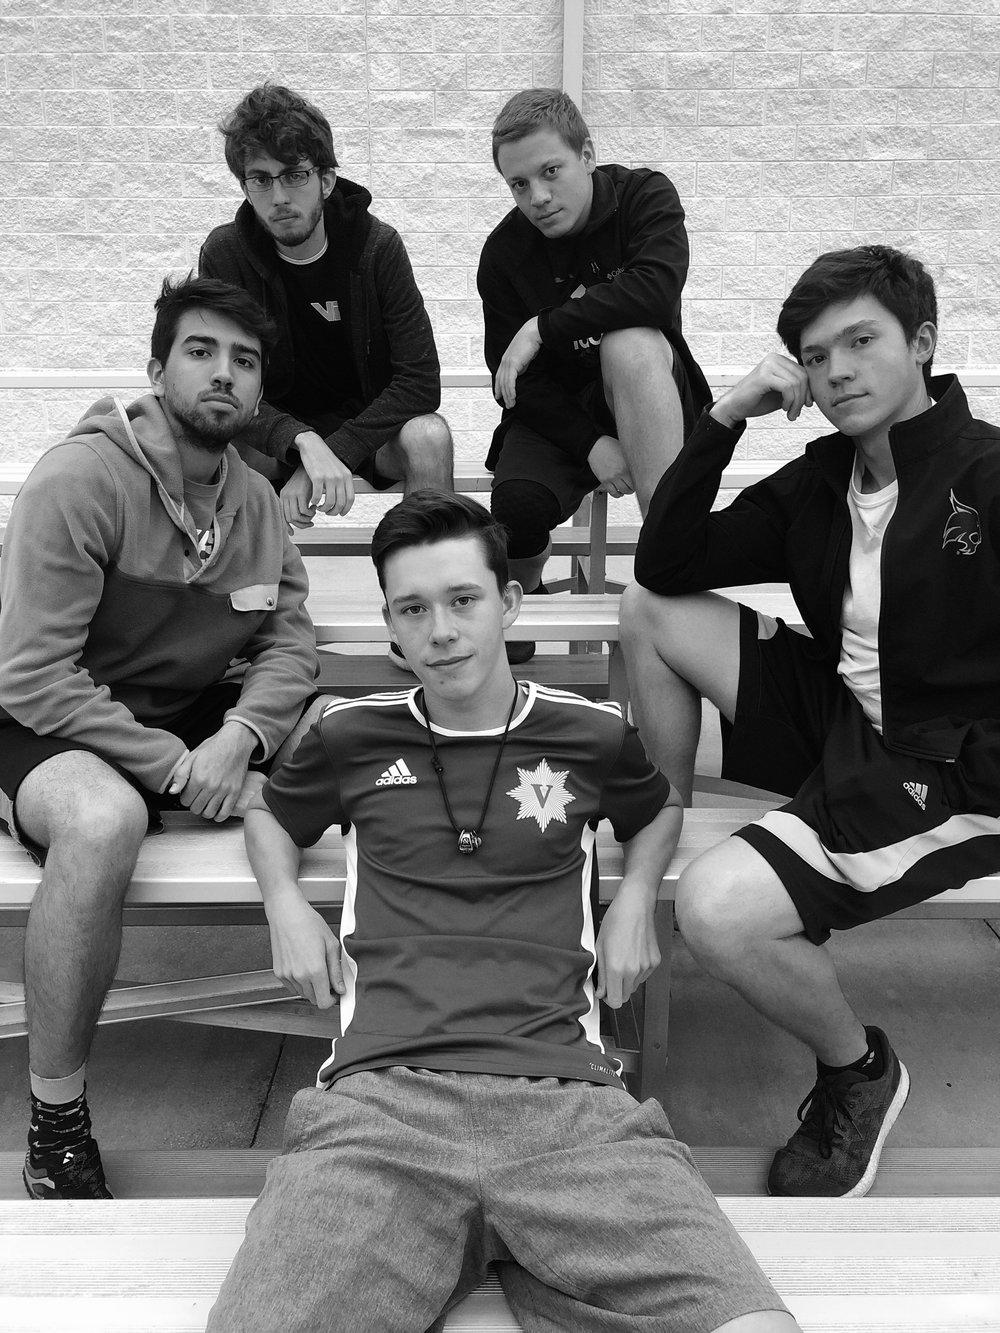 Quads - Henry Grimshaw, Aaron Perez, Matthew Zintgraff, David Gatlin, Christian Blocker